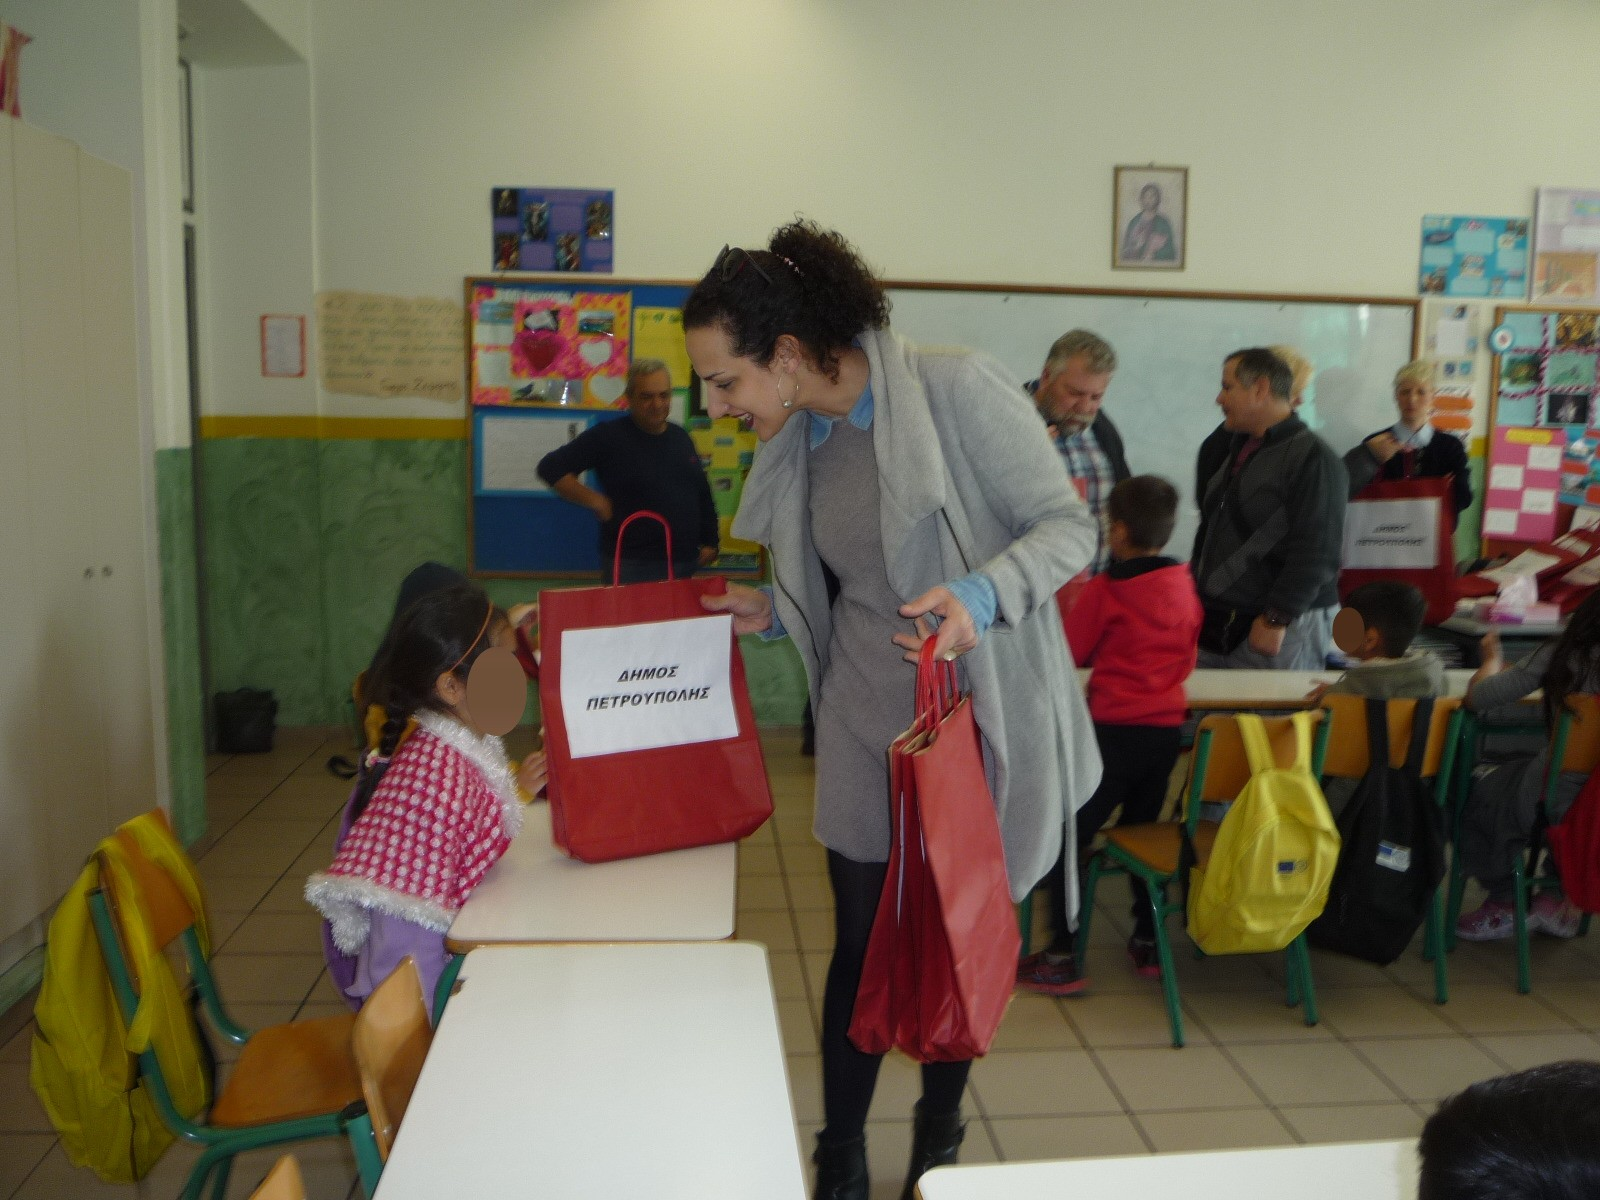 abe229b3d5 Παράδοση σχολικών ειδών στους πρόσφυγες μαθητές σε σχολείο του ...